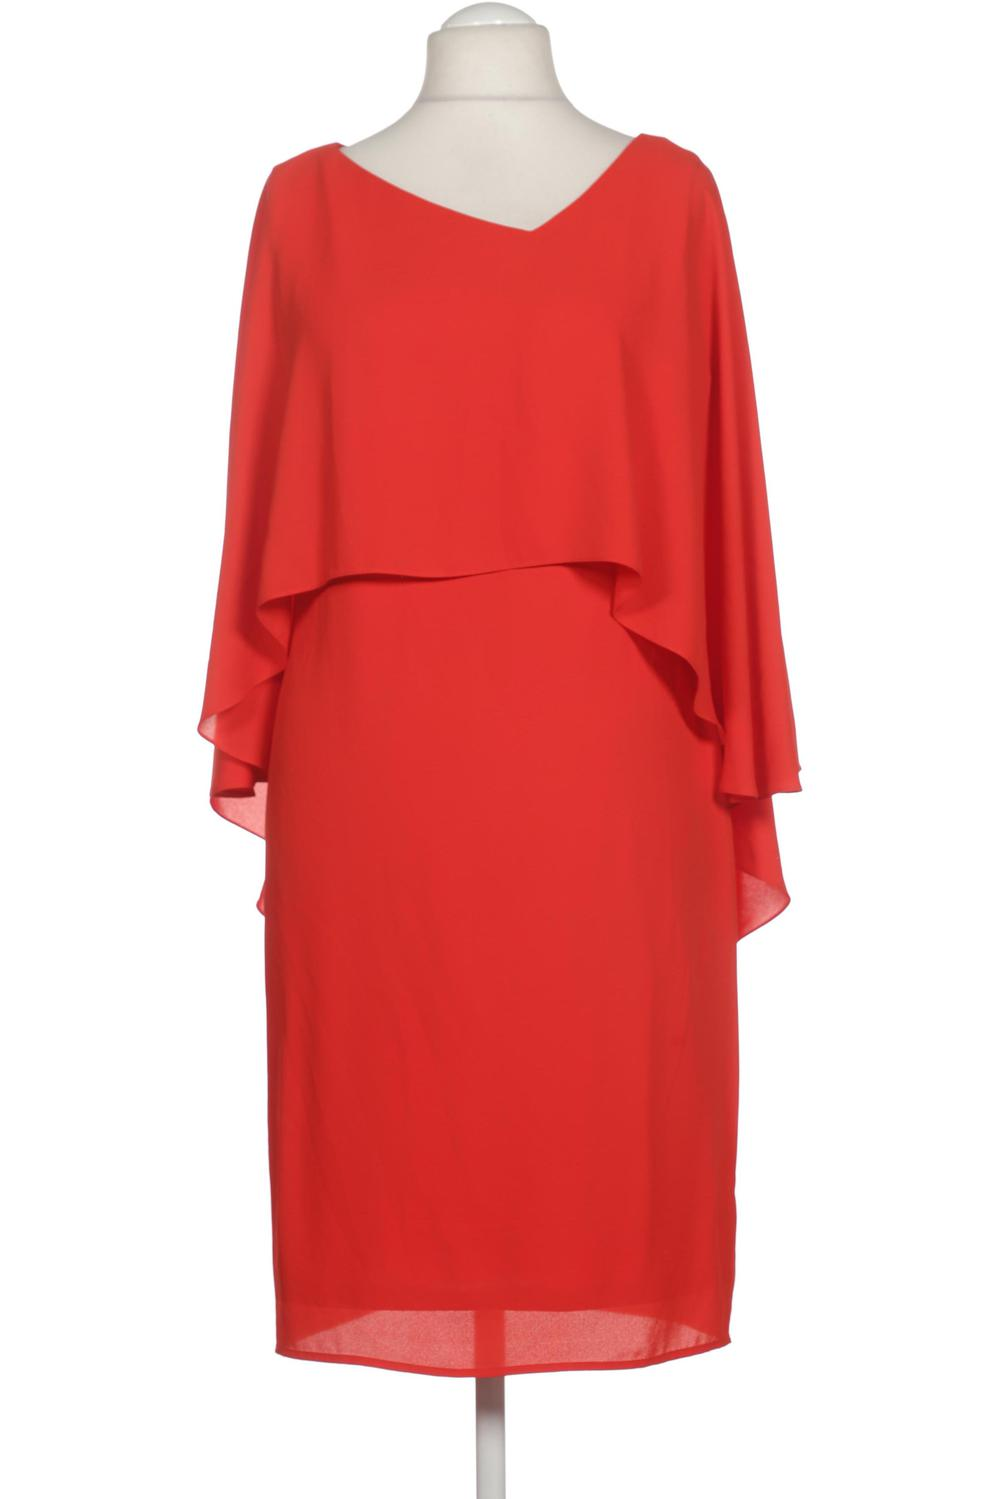 Joseph Ribkoff Damen Kleid UK 16 Second Hand kaufen | ubup